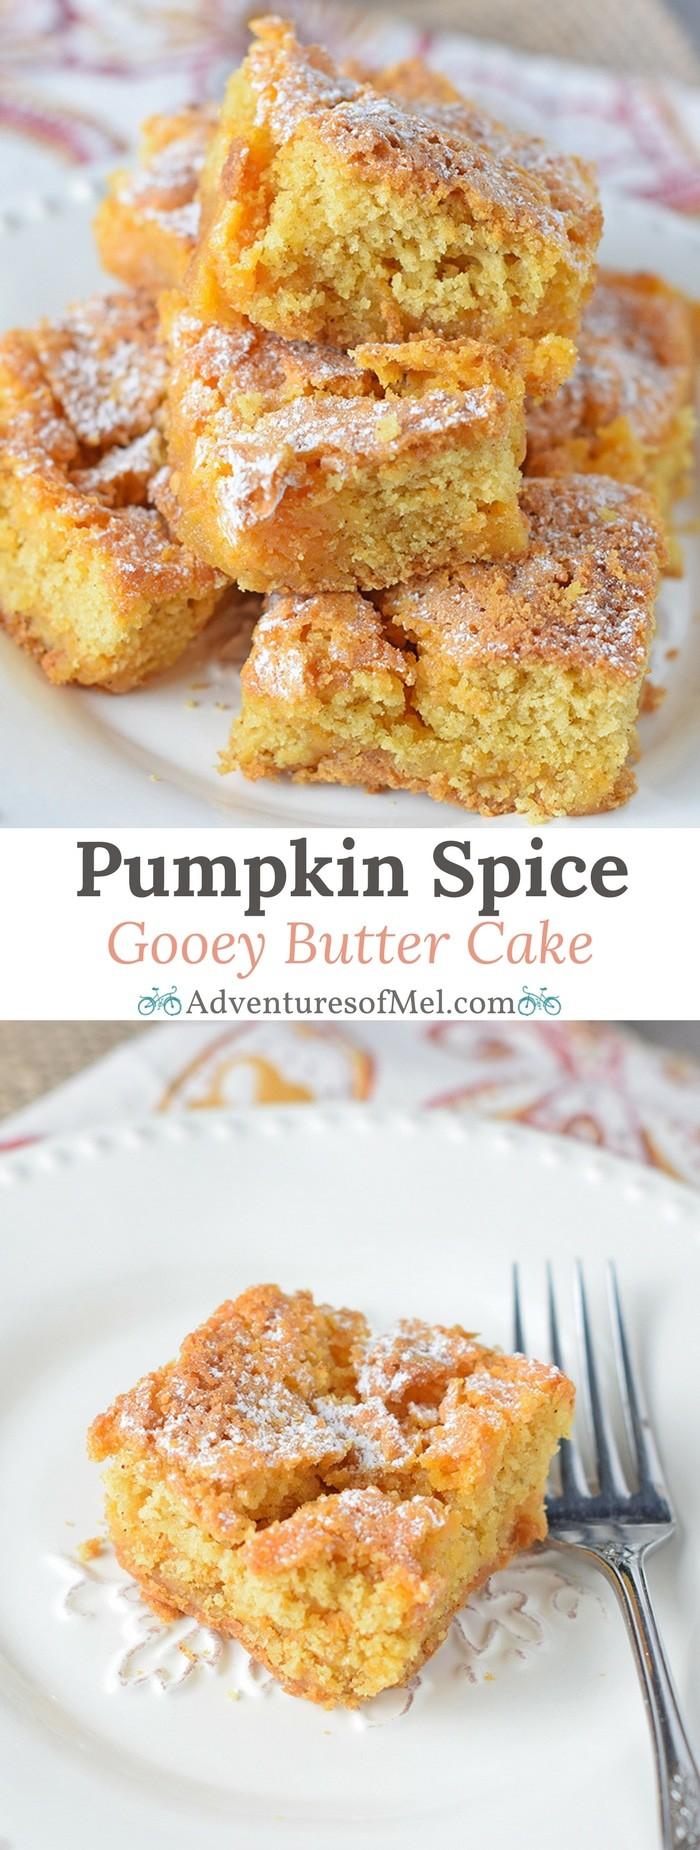 Pumpkin Spice Gooey Butter Cake, a scrumptious cake mix recipe. Fall dessert filled with ooey gooey, buttery, cream cheese goodness.